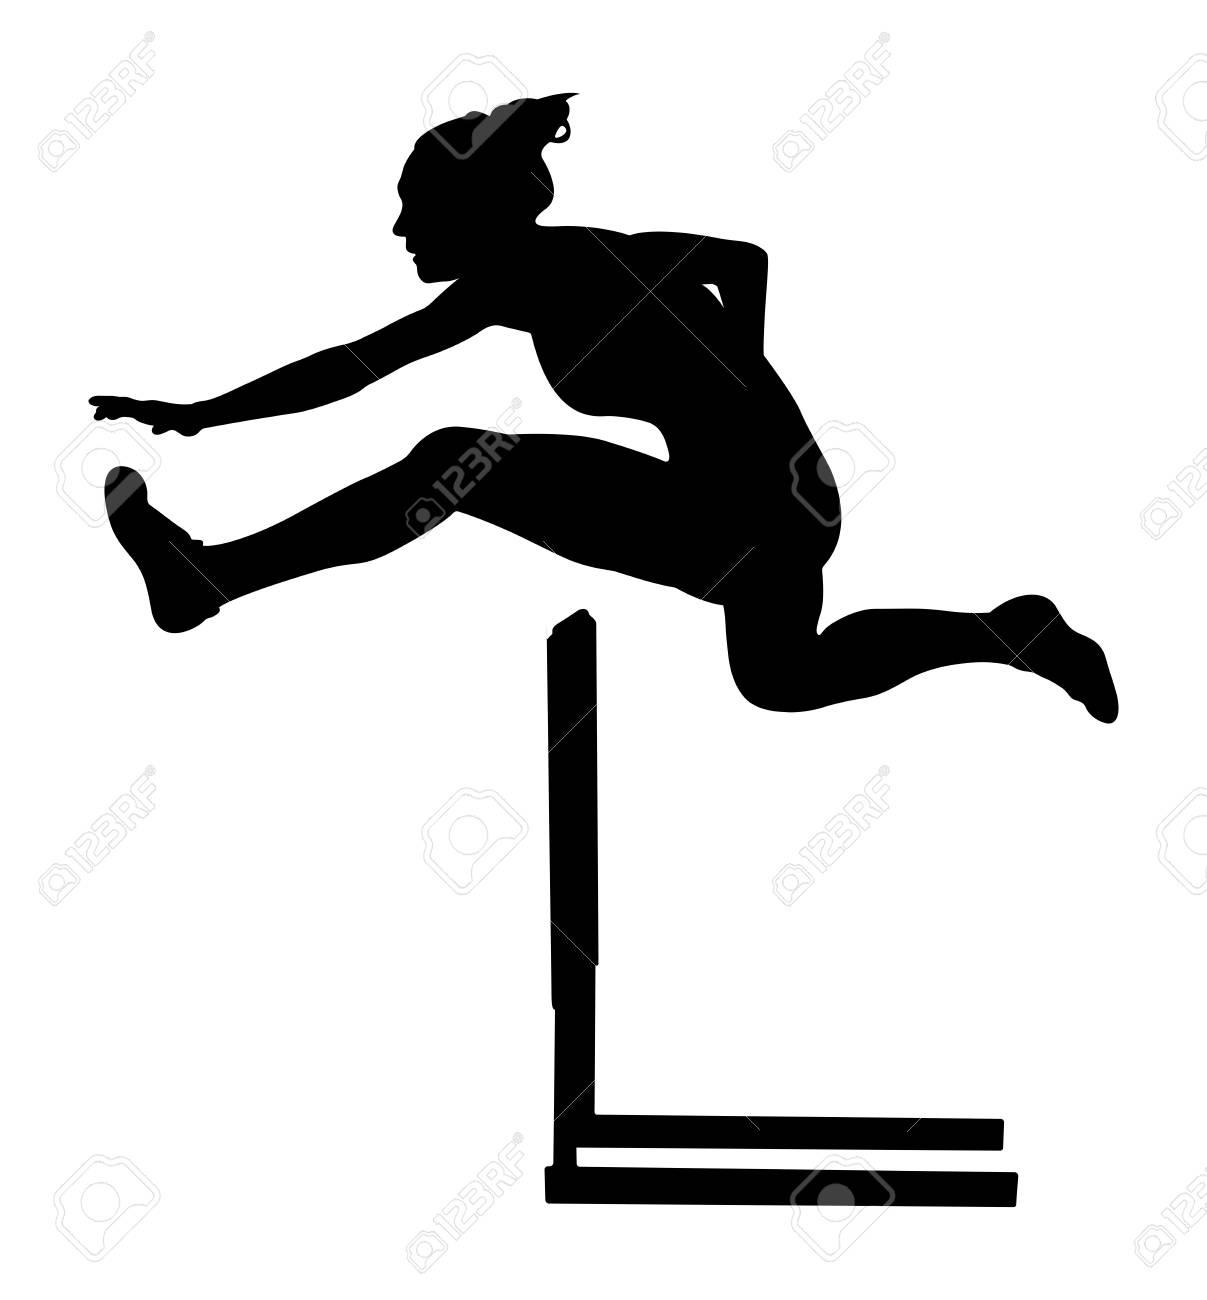 100 m hurdles woman runner athlete black silhouette - 81572034